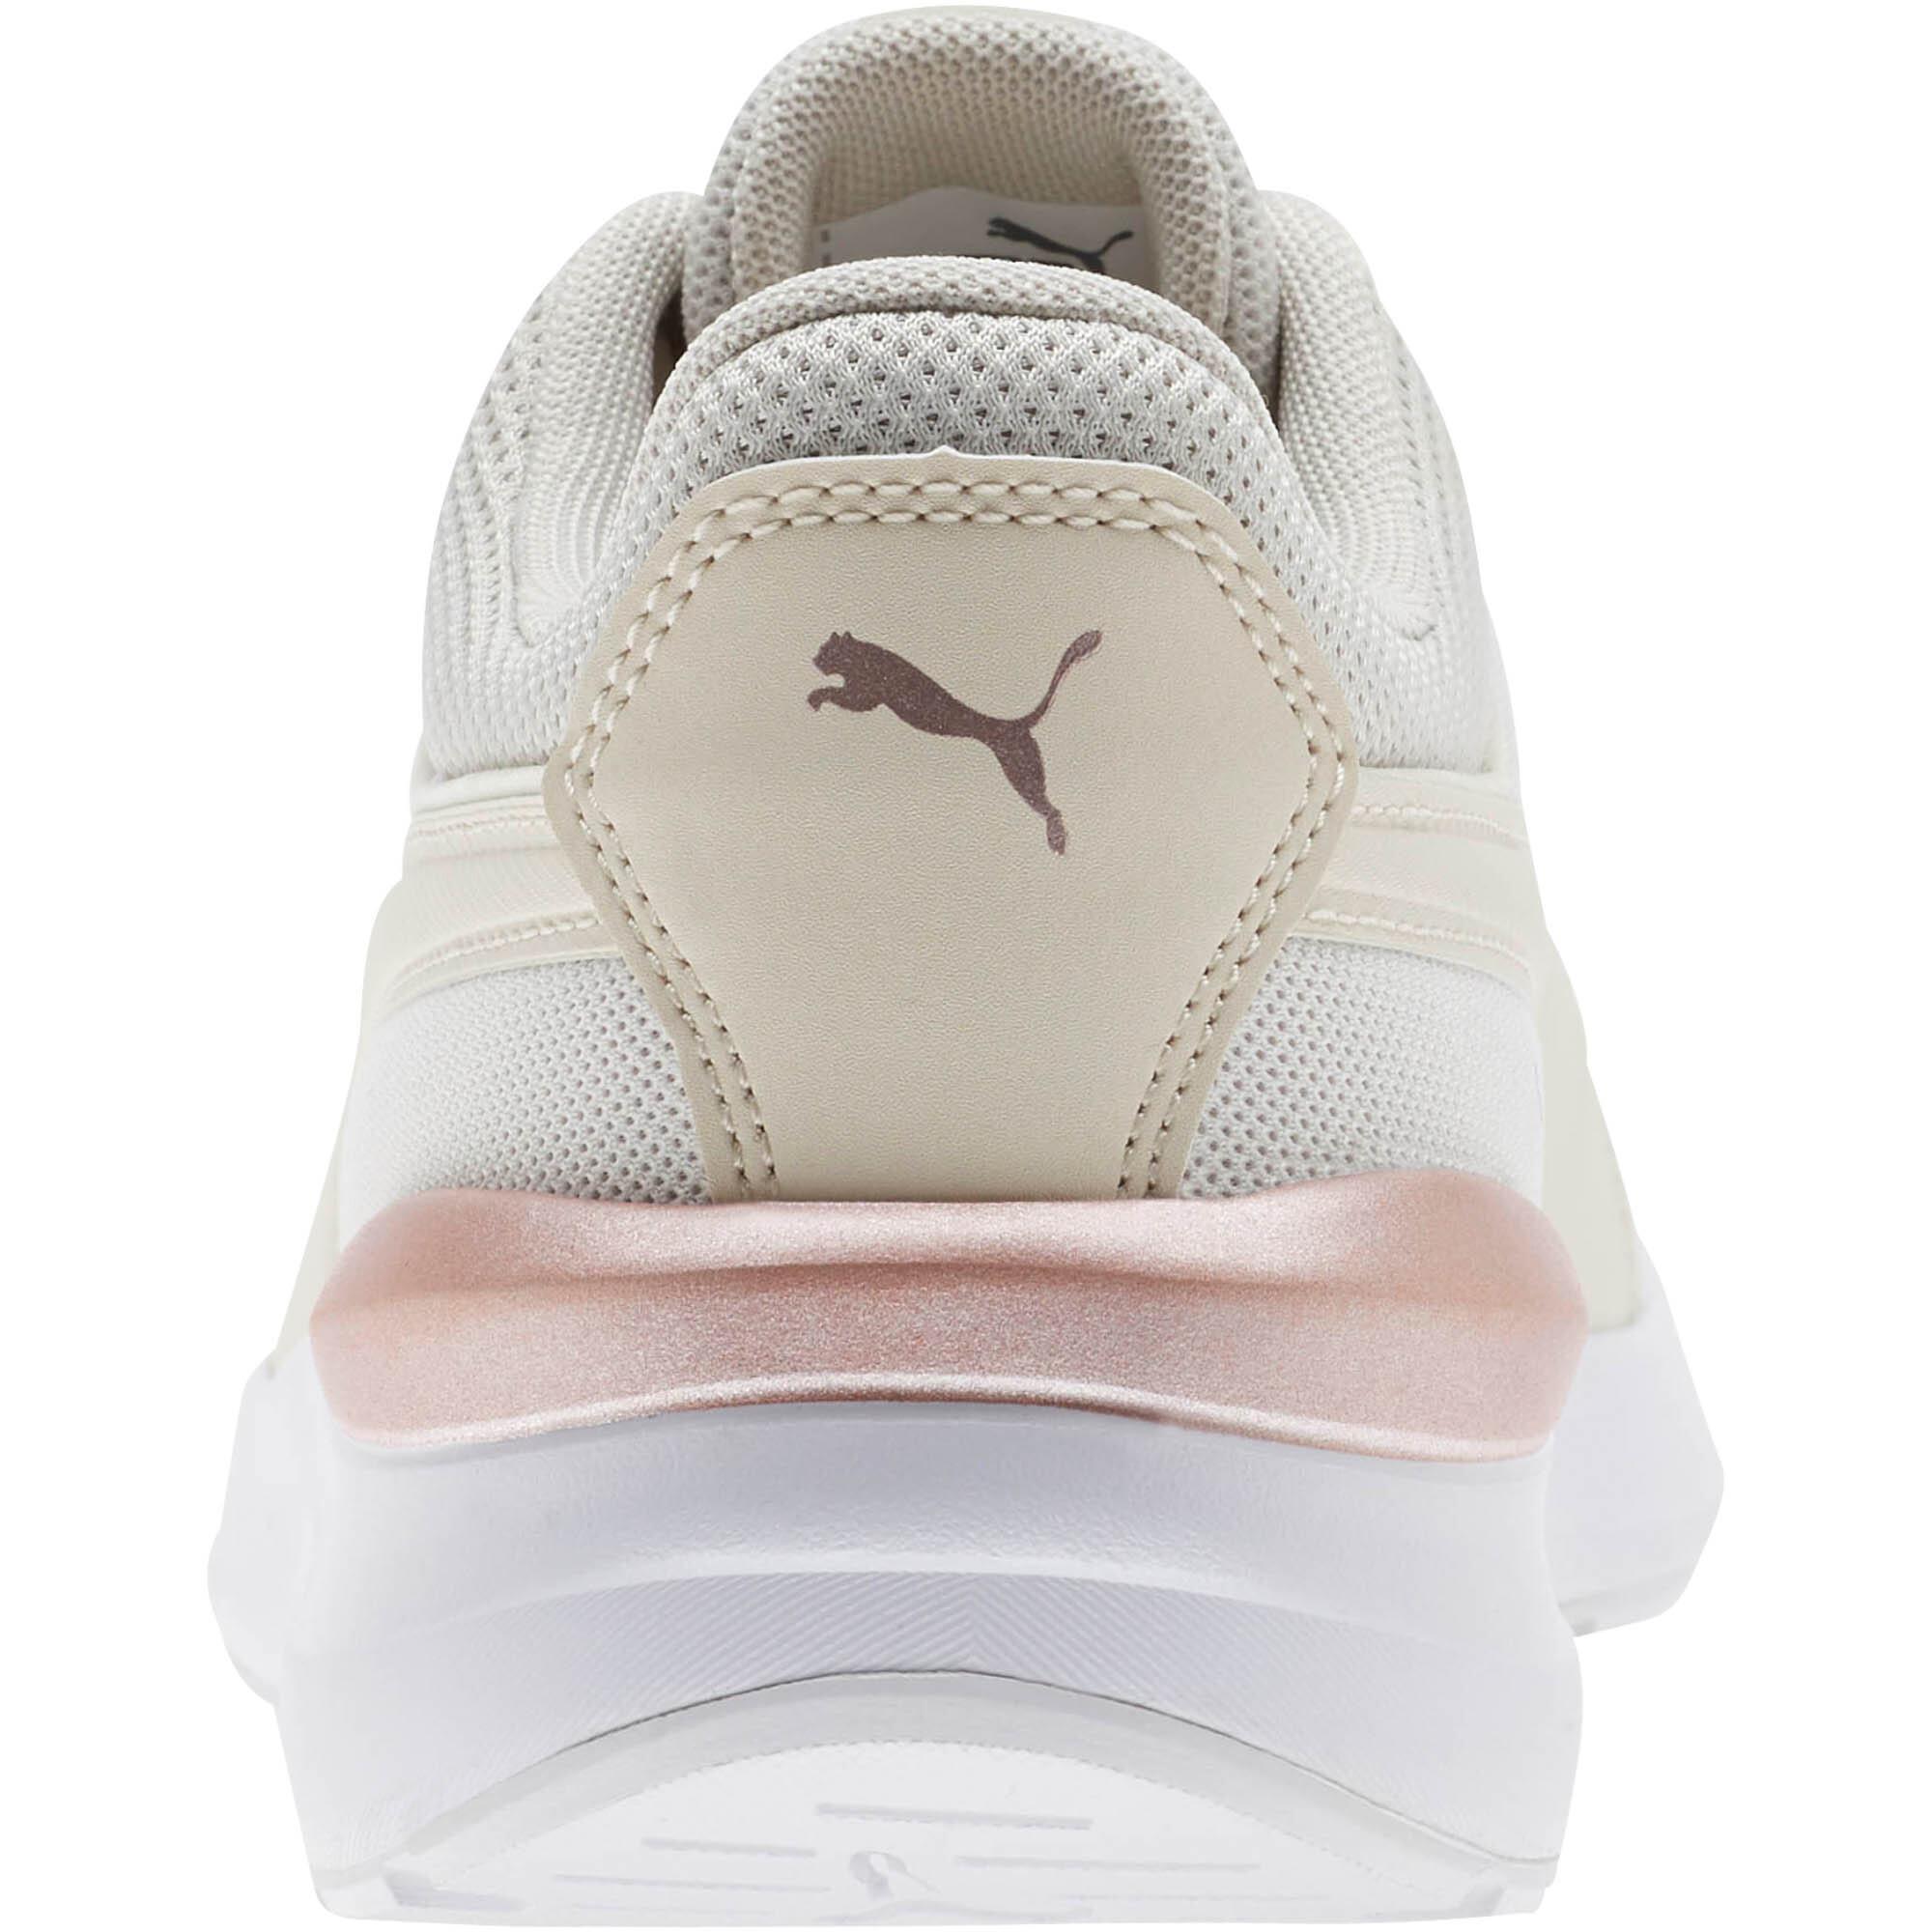 PUMA-Adela-Mesh-Women-s-Sneakers-Women-Shoe-Basics thumbnail 13